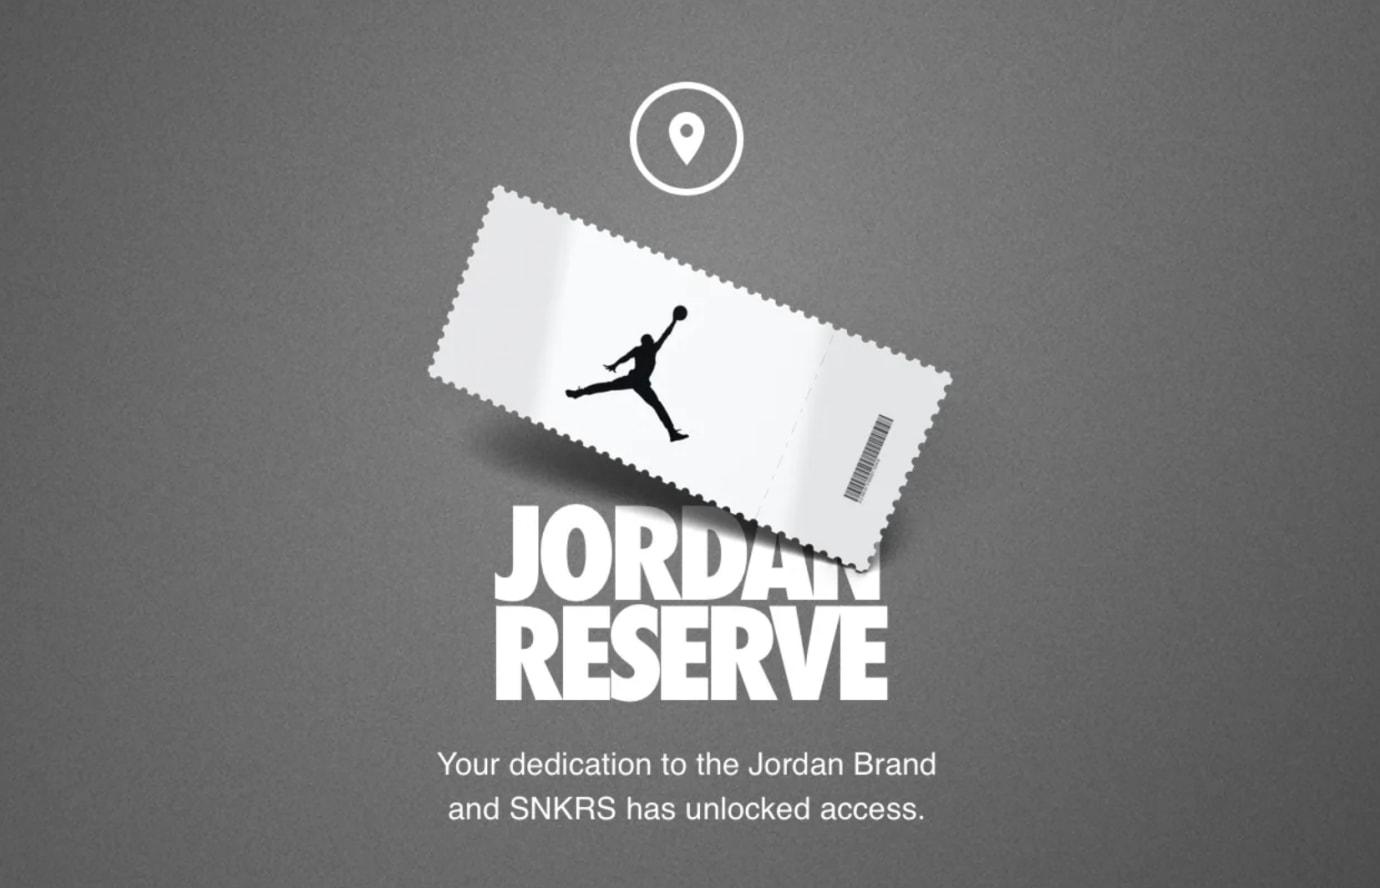 Jordan Reserve Air Accesss